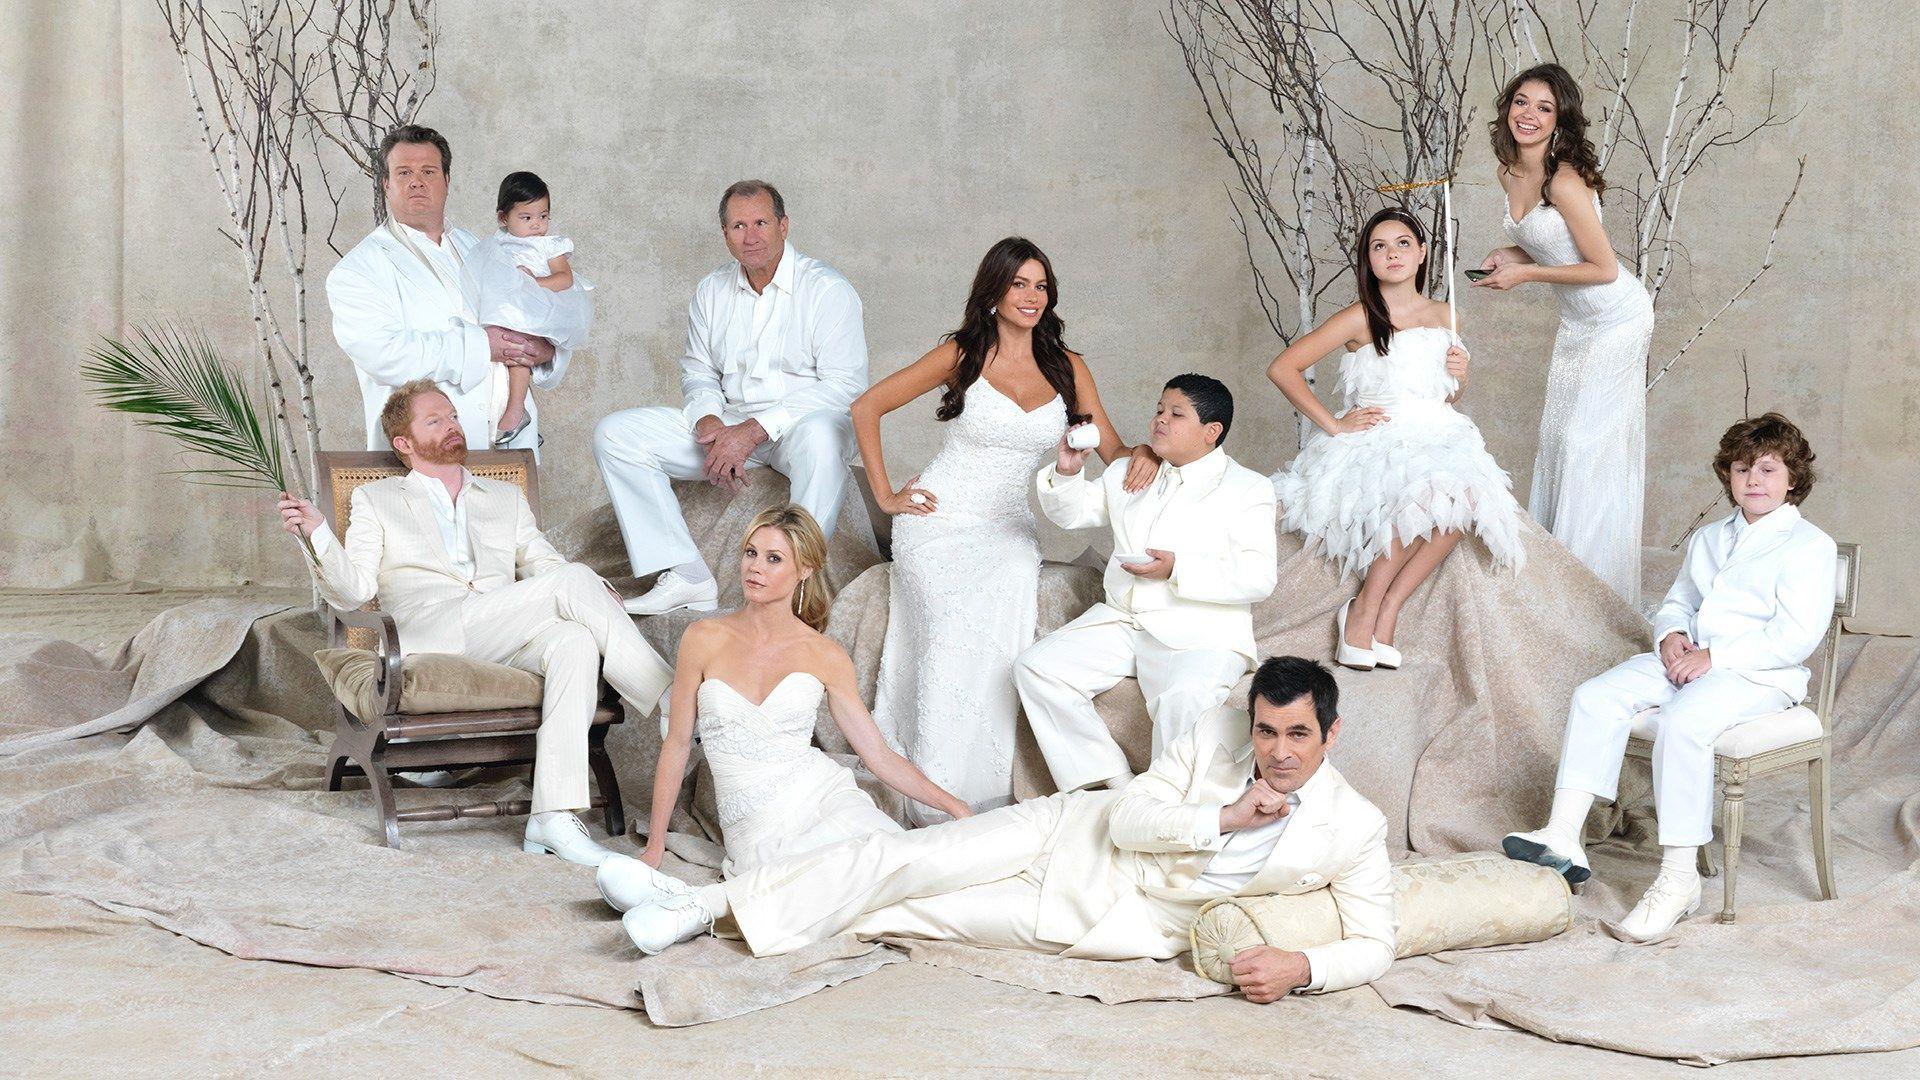 1920x1080 Hd Wallpaper Modern Family Modern Family Episodes Modern Family Season 2 Modern Family Tv Show